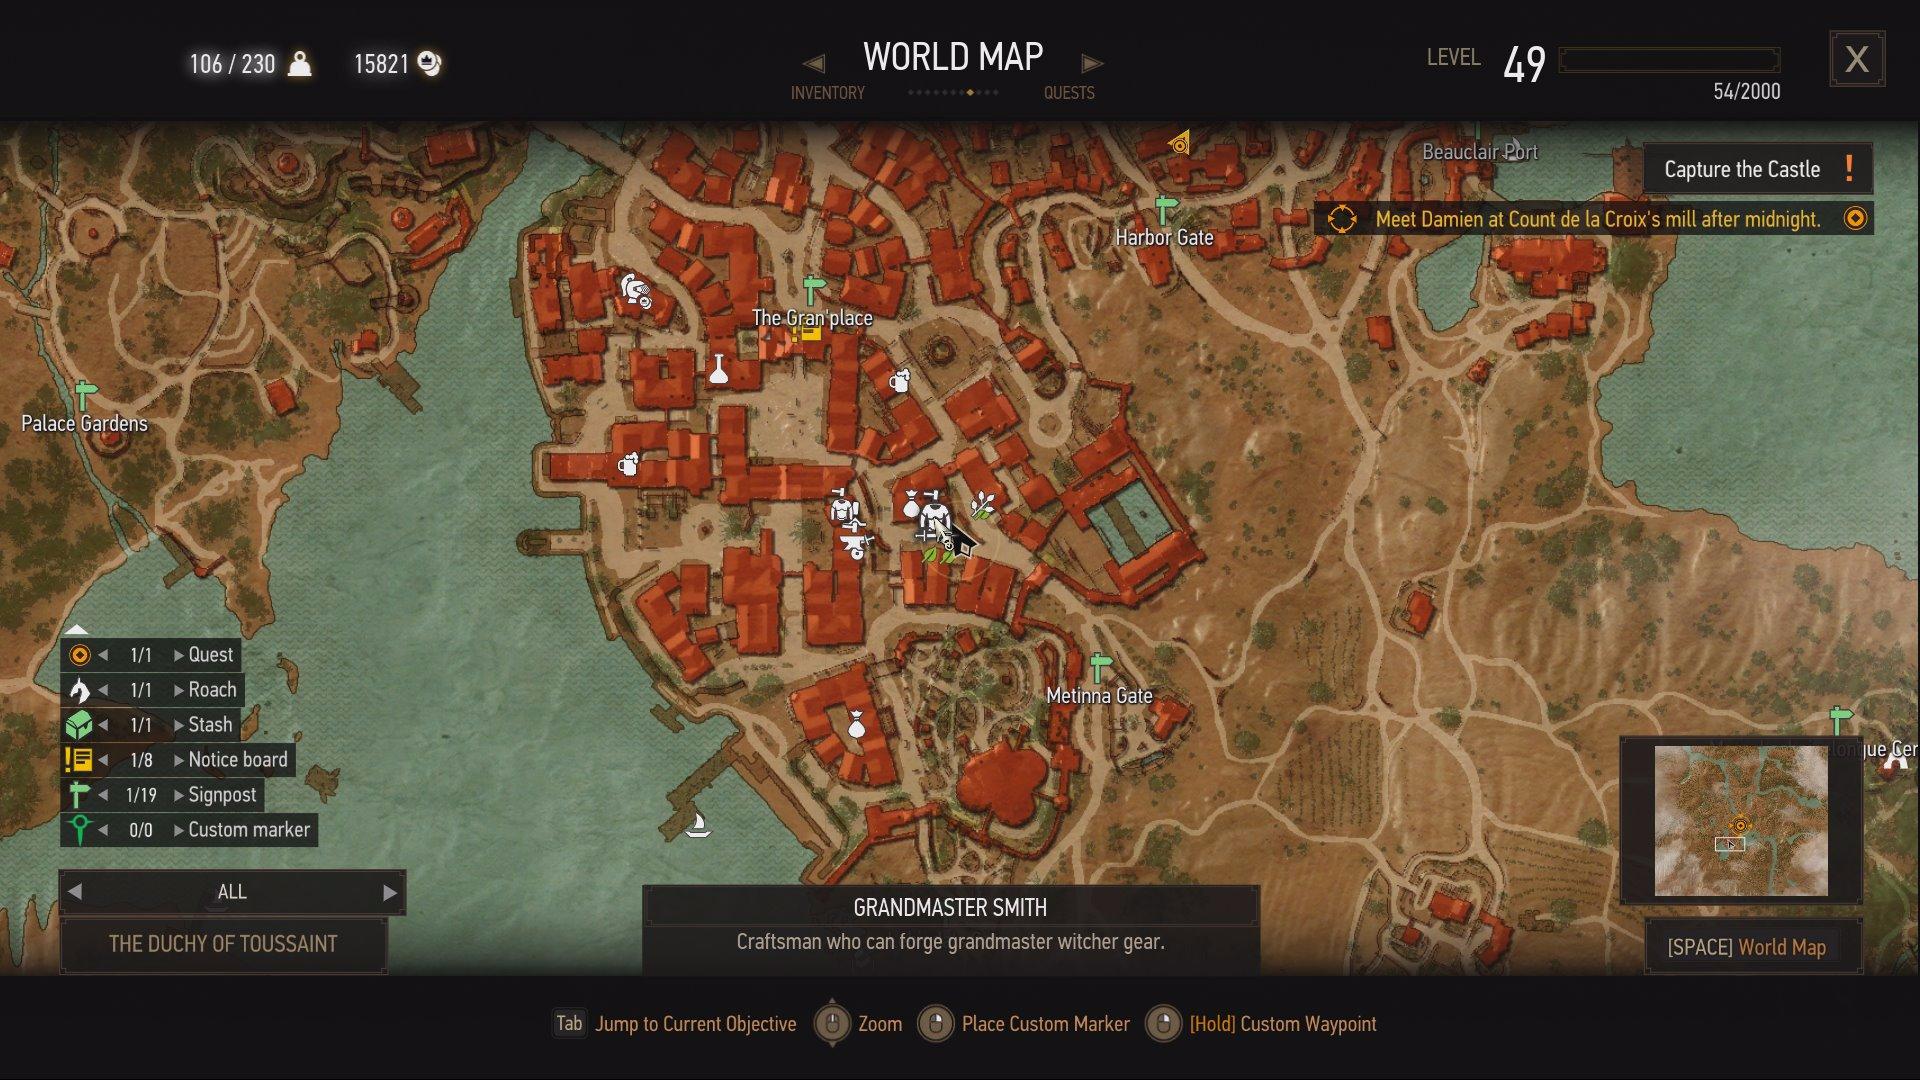 Witcher 3 - Grandmaster Smith location